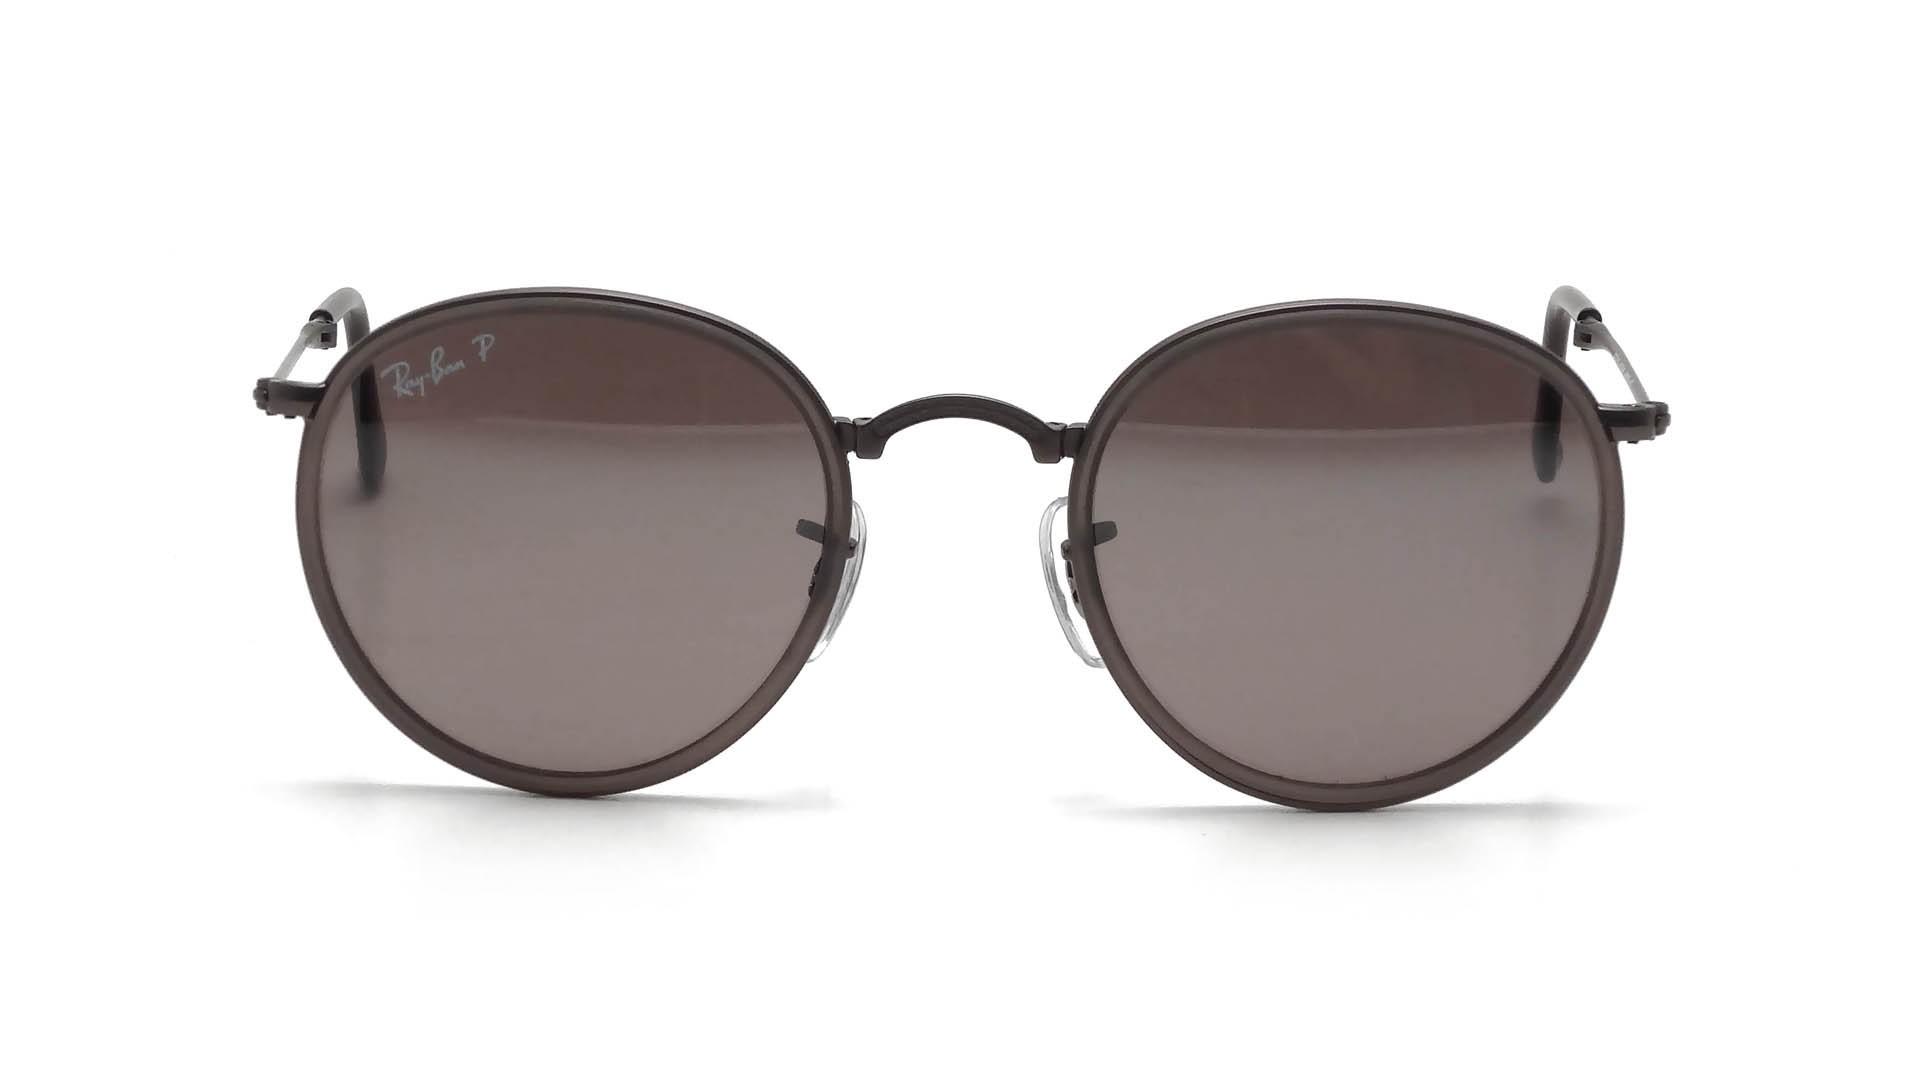 d717cf2cf8c Ray Ban Wayfair Sunglasses Celebrities Finders « Heritage Malta